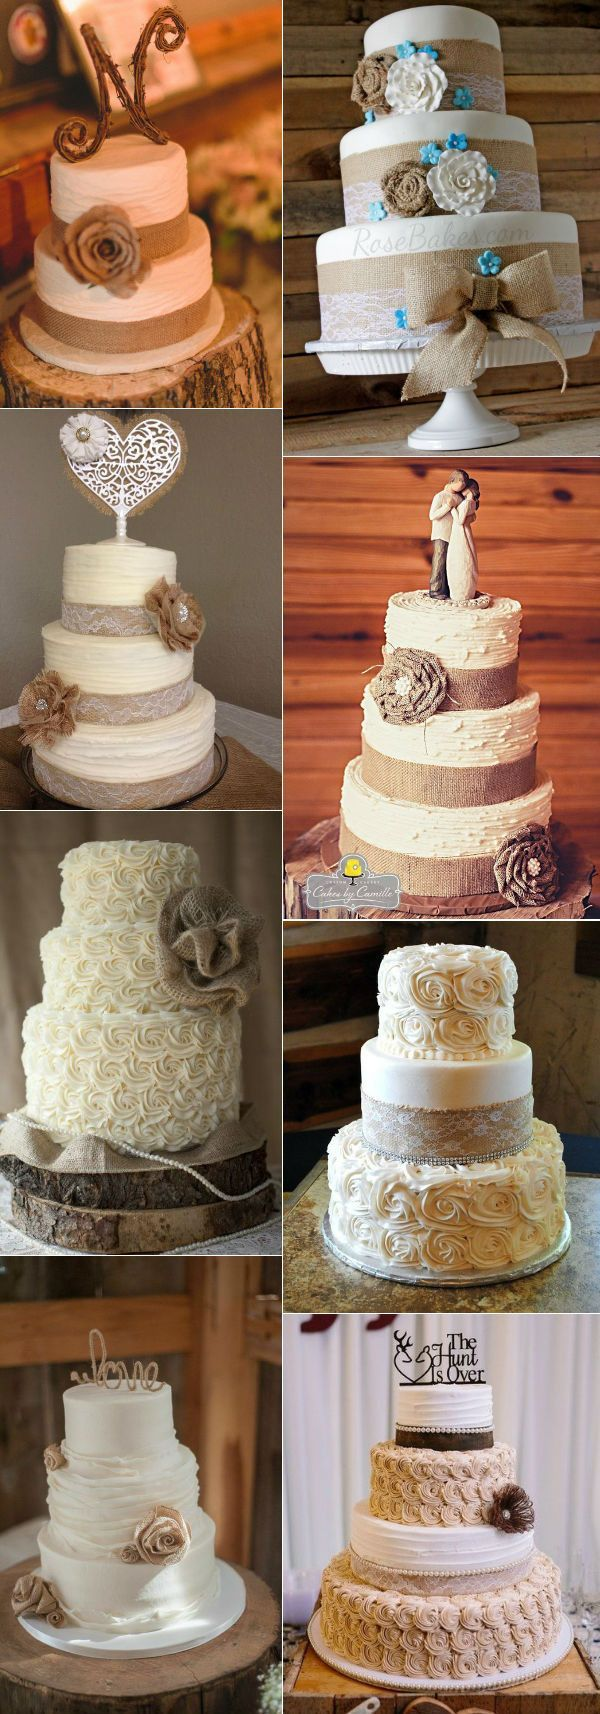 amazing wedding cakes perfect for fall lace weddings wedding